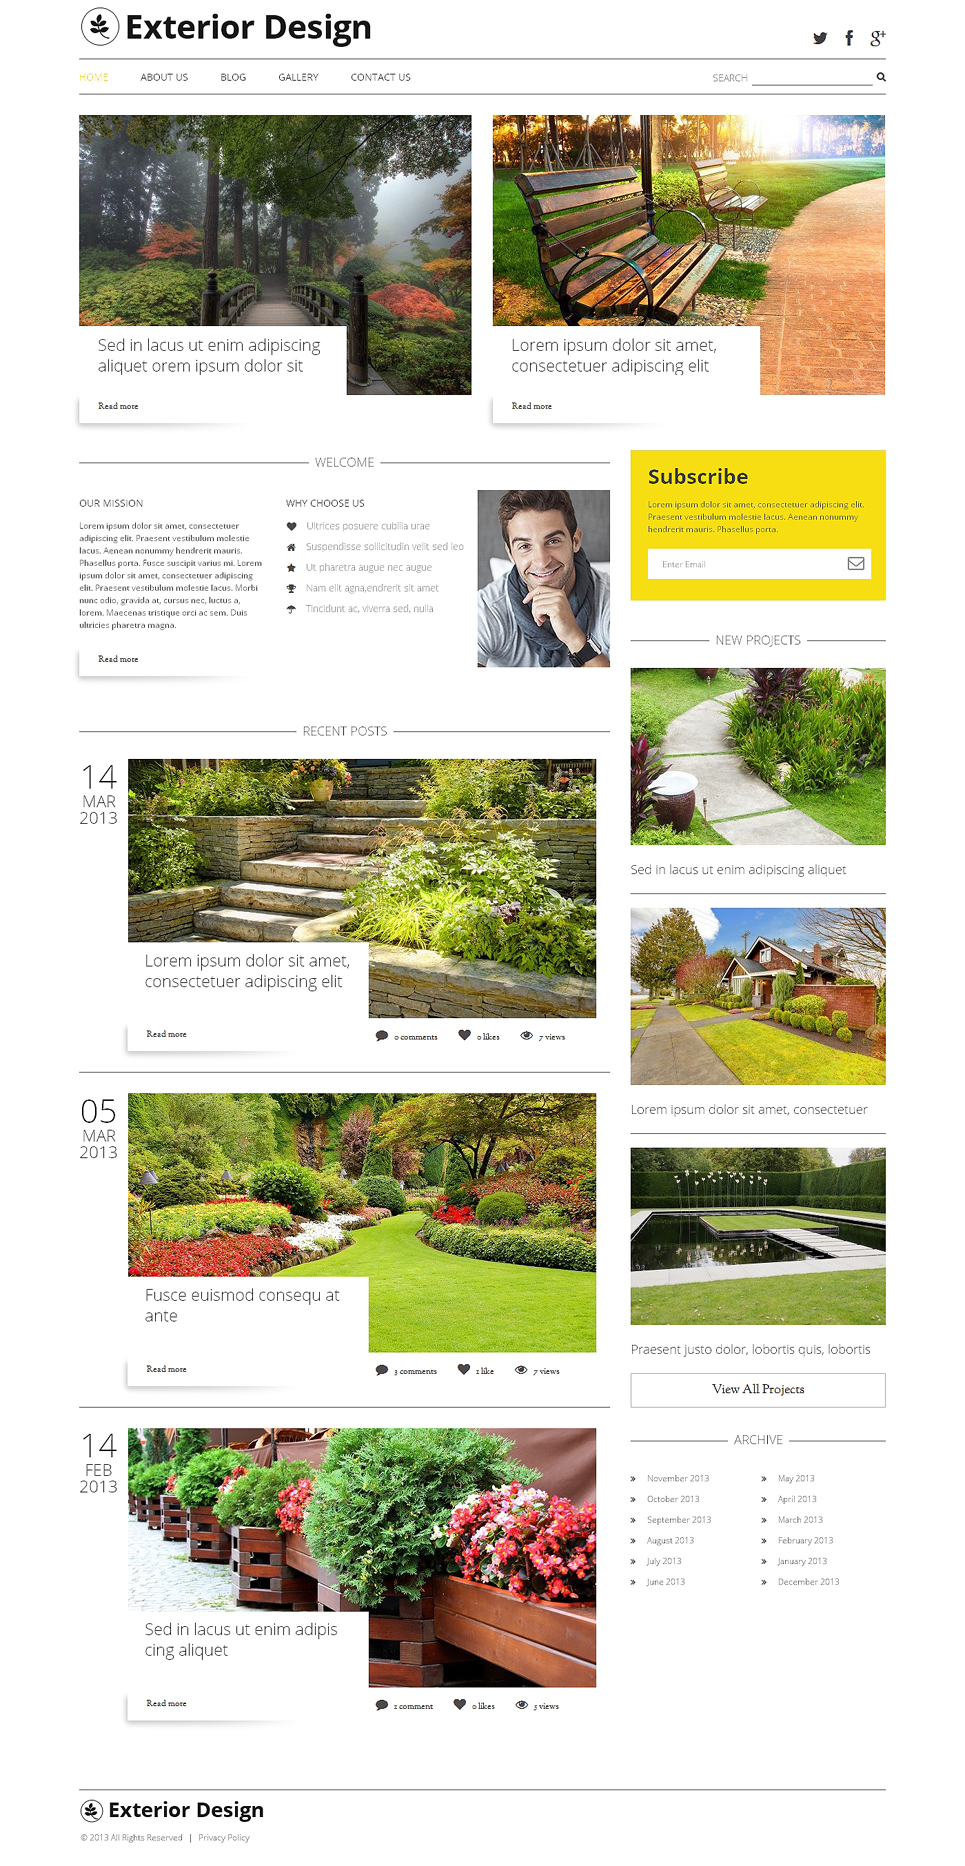 Exterior Design Blog WordPress Theme